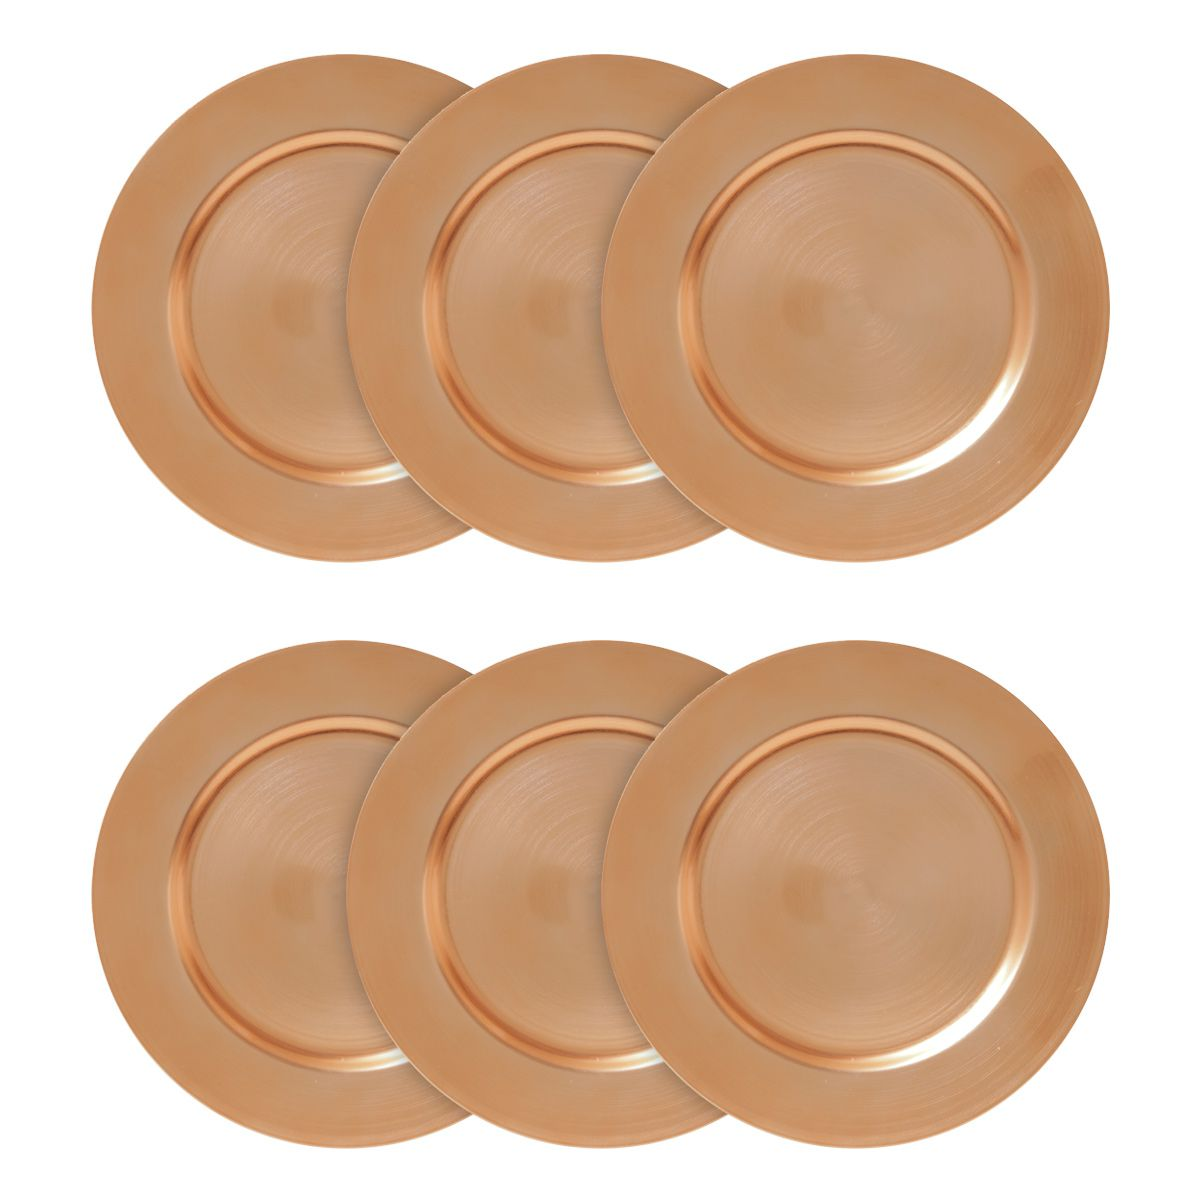 Jogo 6 peças Sousplat 33 cm de plástico dourado Opala Lyor - L4293